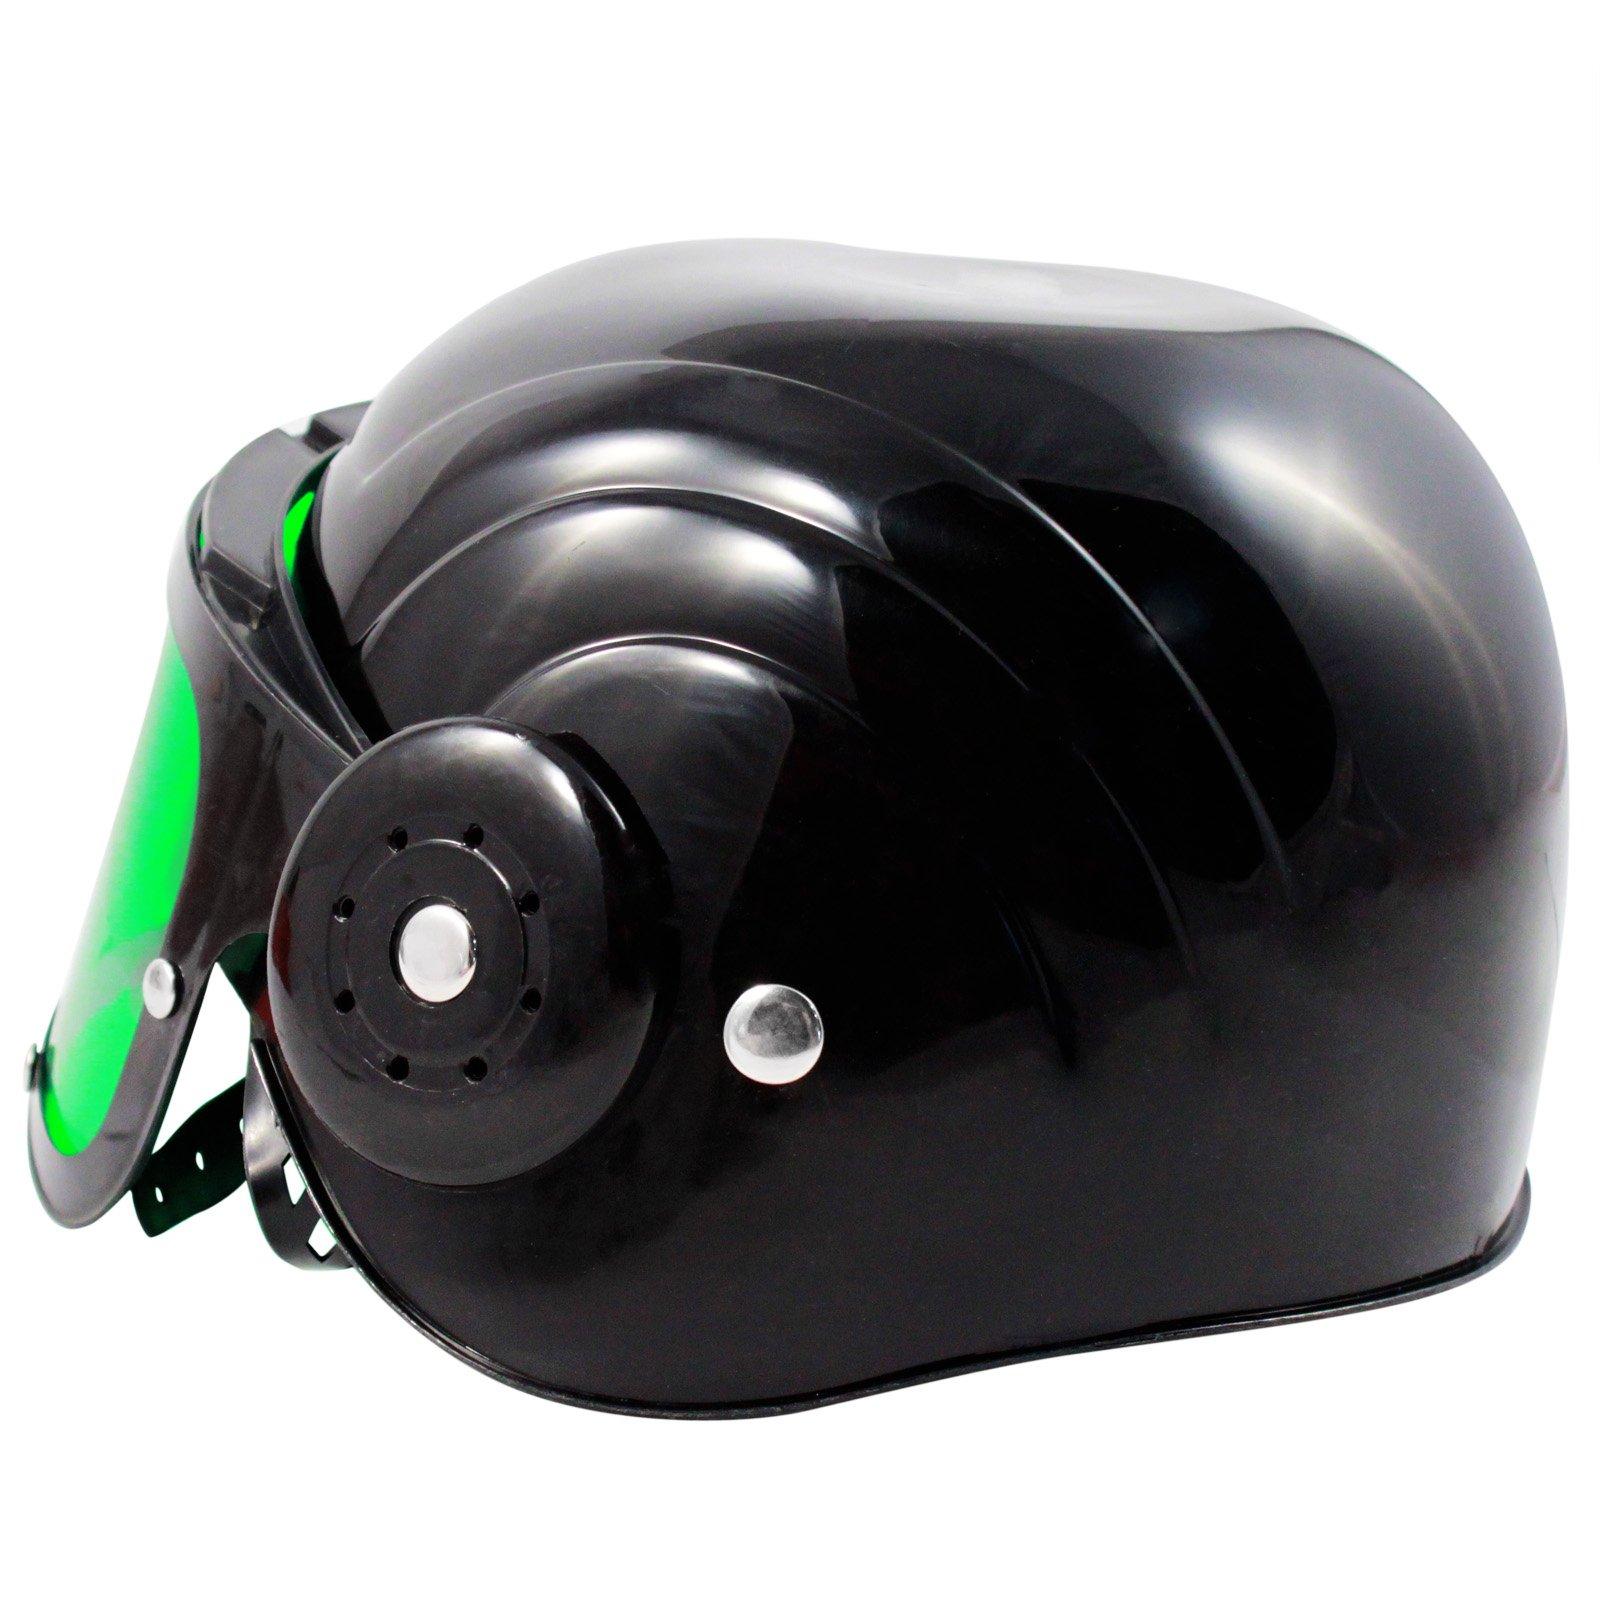 Combat Police Helmet Dress Up Play Set with Accessories